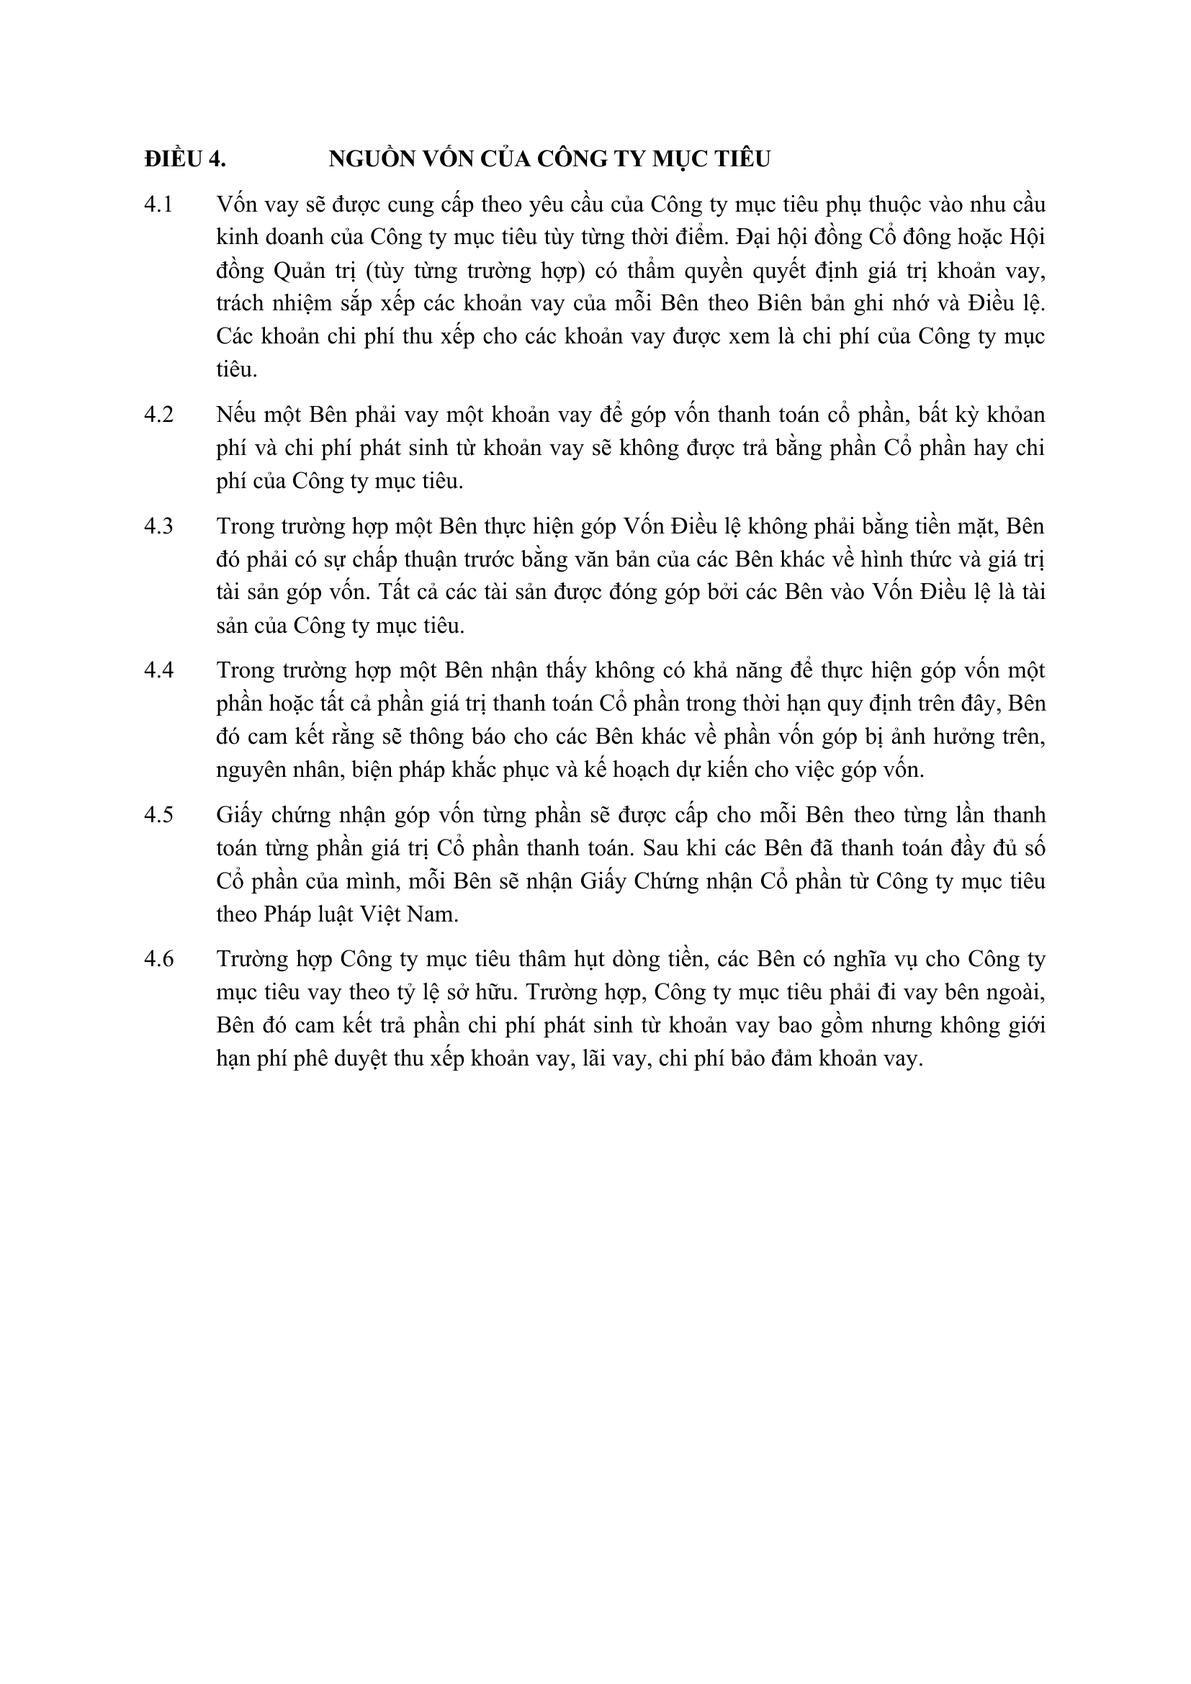 Memorandum of Understanding for creating a technical company -1